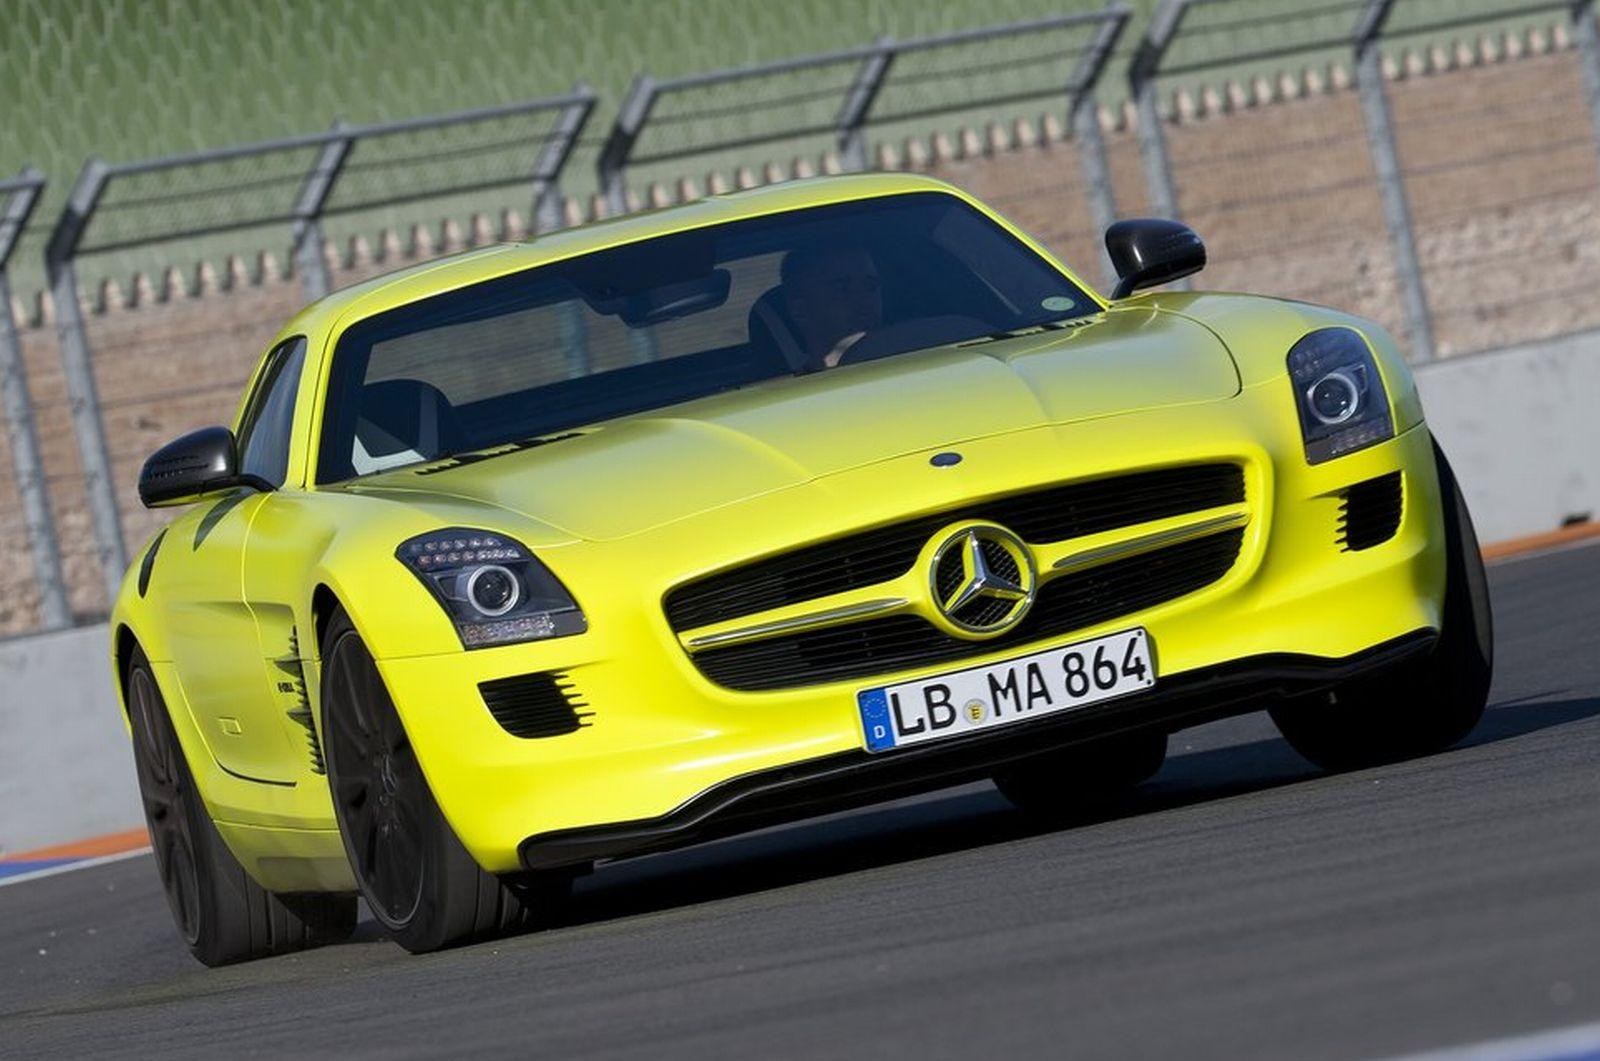 Sport car garage mercedes benz slc amg 2015 for Sport mercedes benz new car